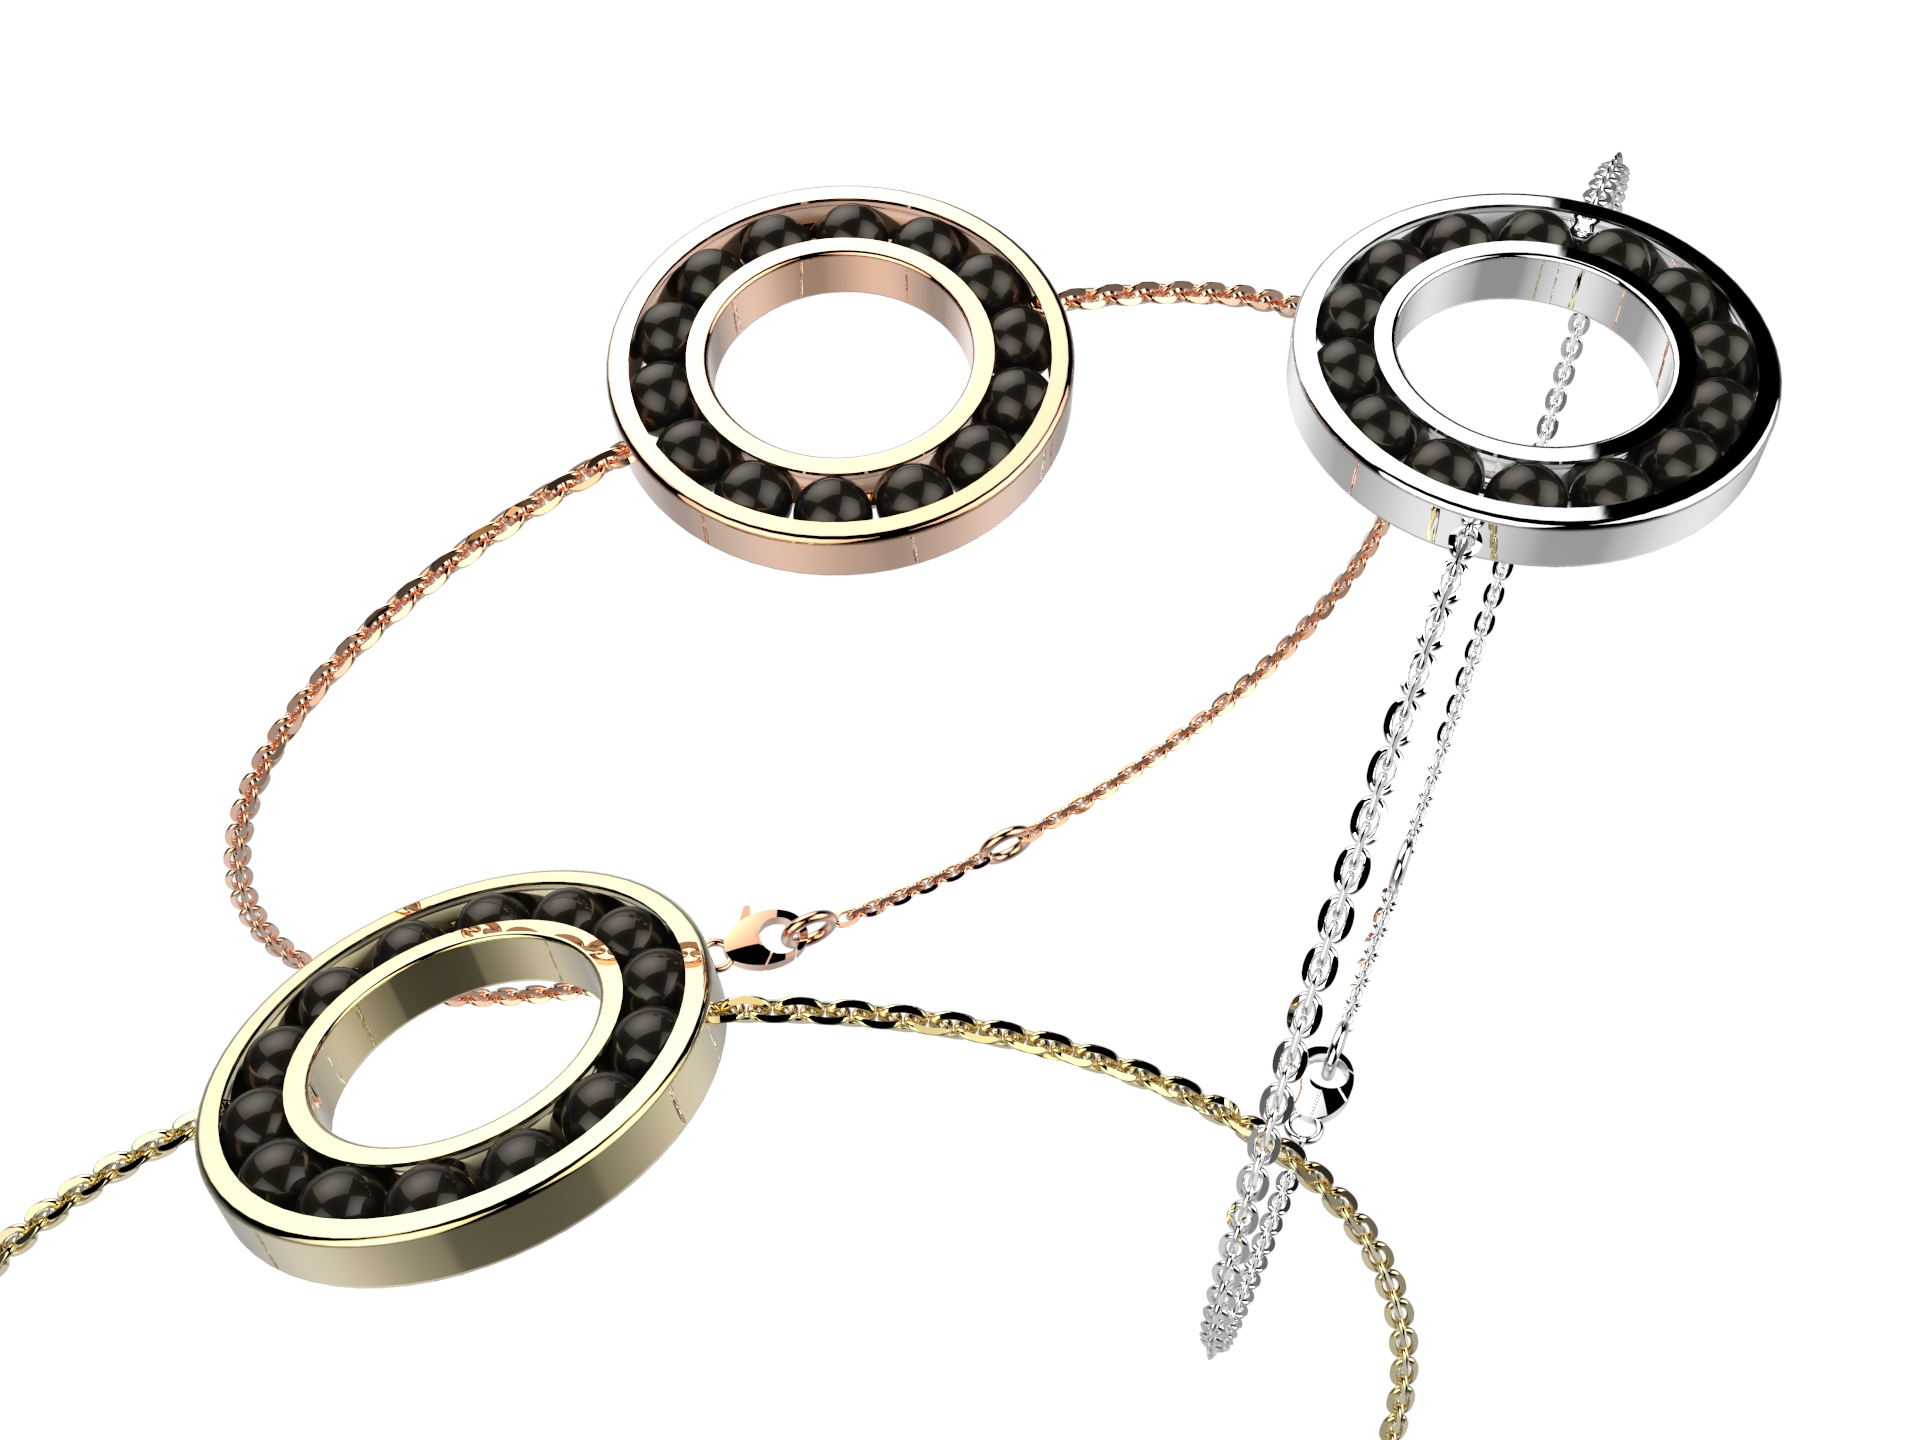 Bracelet chaine or agate noir 720 €